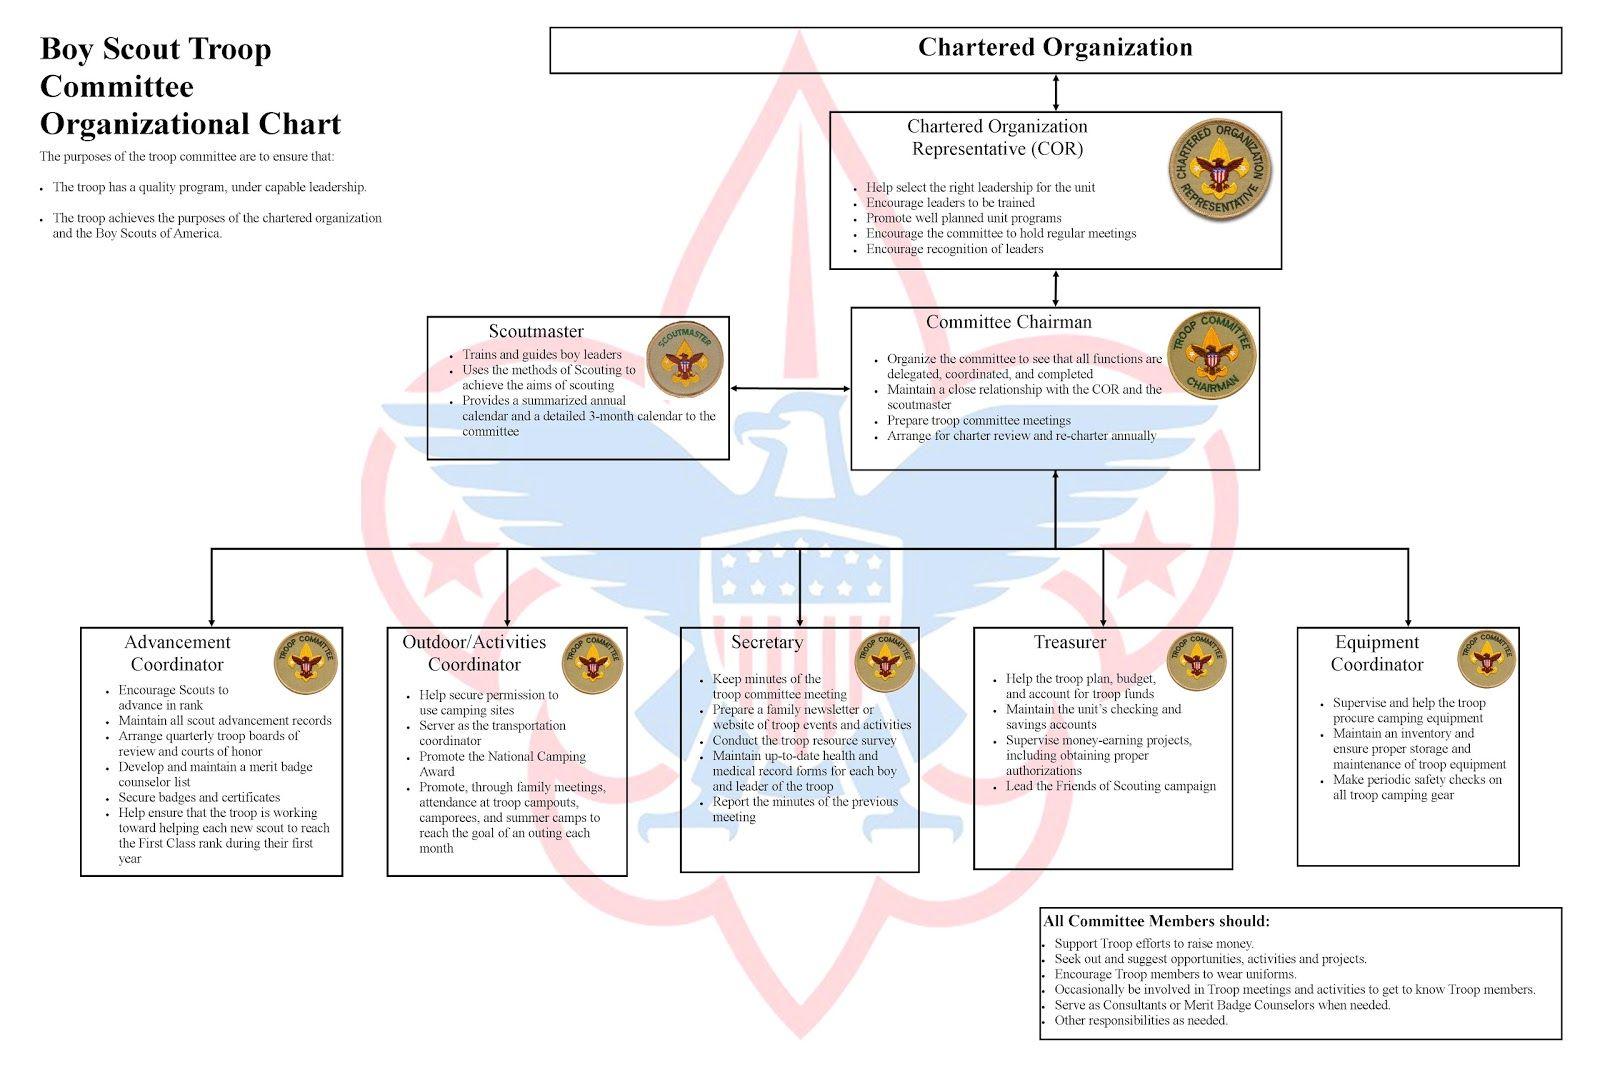 Troop Committee Poster Jpg 1600 1067 Meeting Agenda Template Agenda Template Organizational Chart